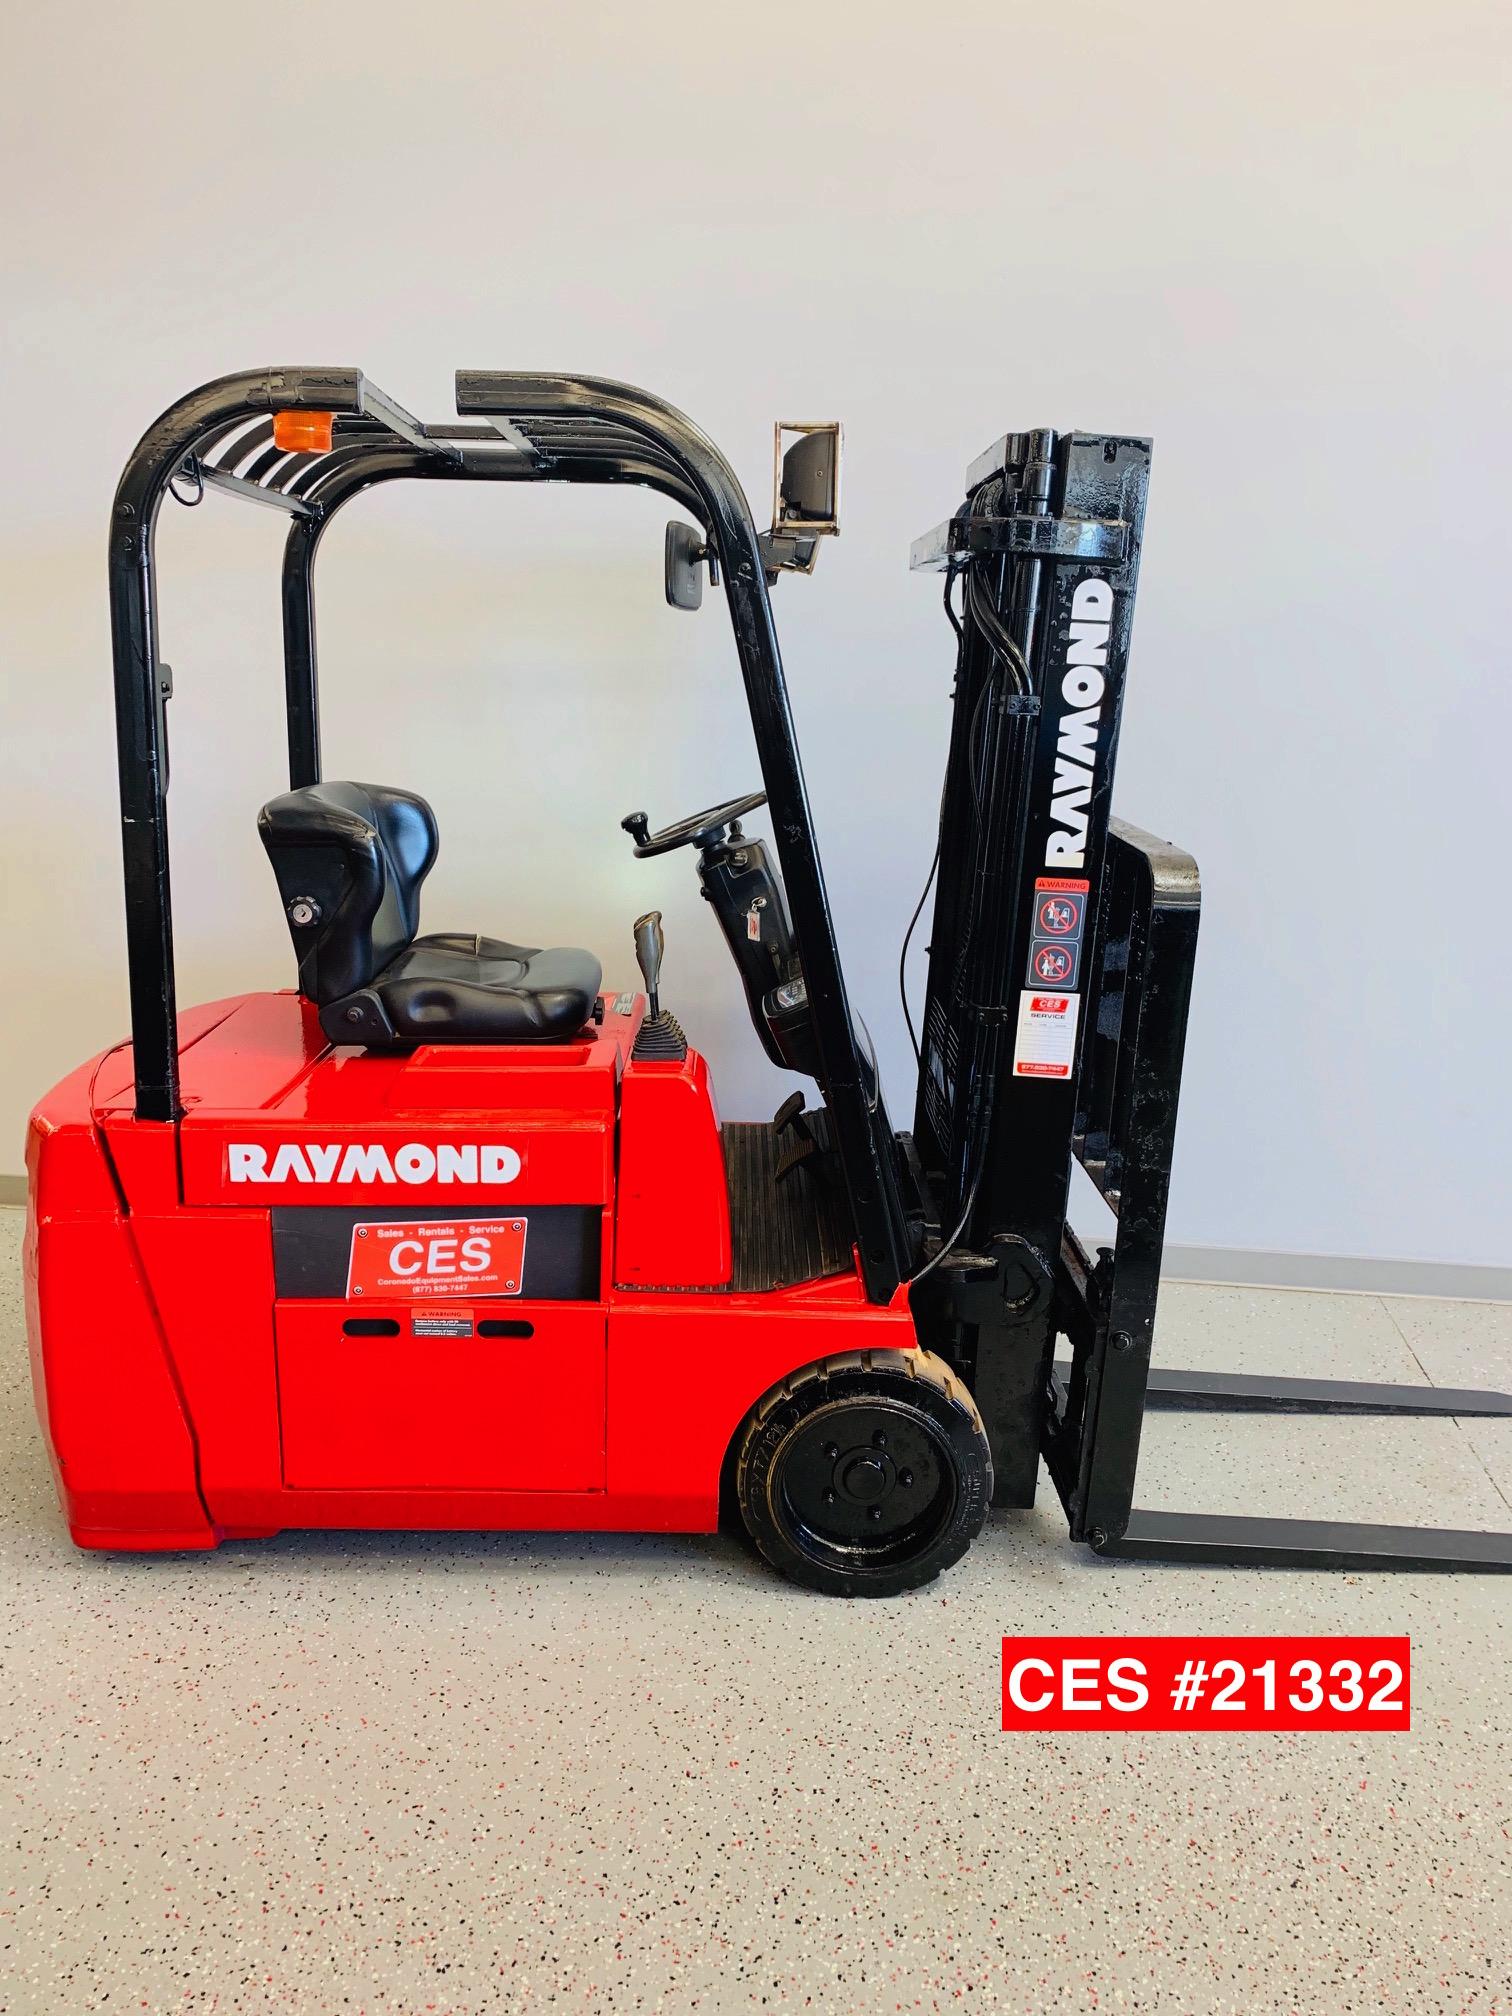 CES #21332 Raymond 445-C30TT 3 Wheel Electric Forklift - Coronado Equipment Sales